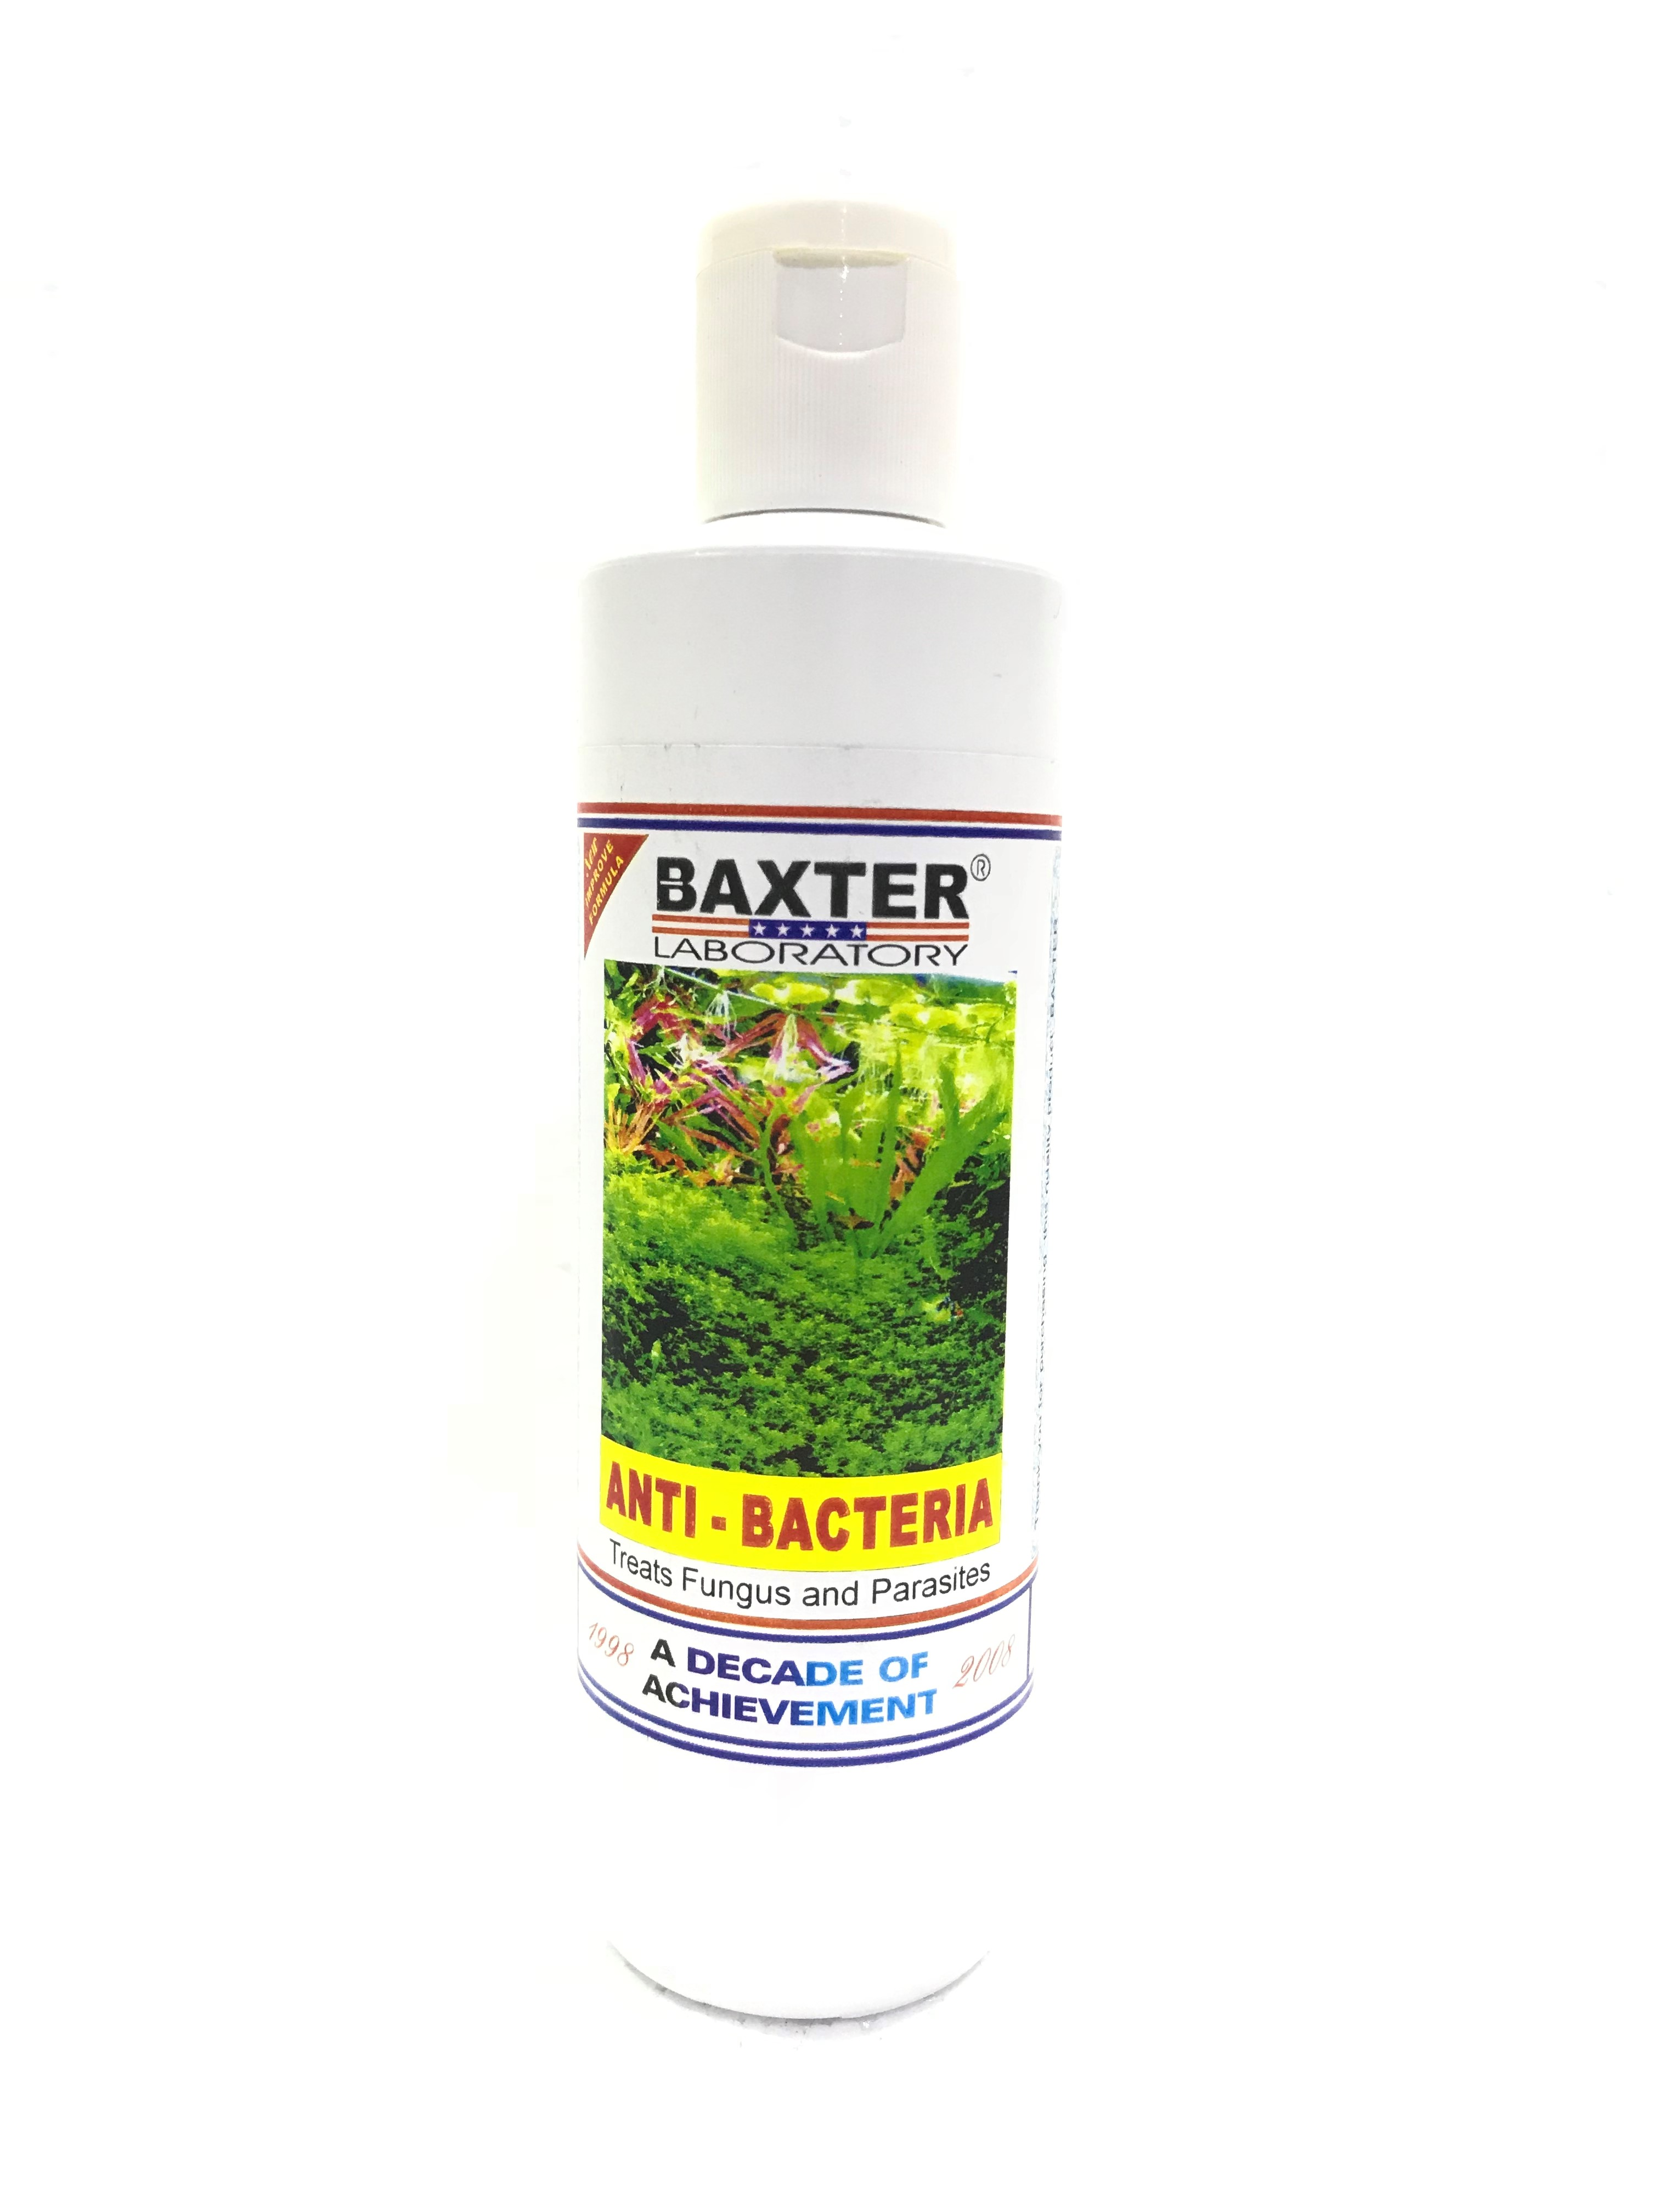 Baxter Anti-Bacteria